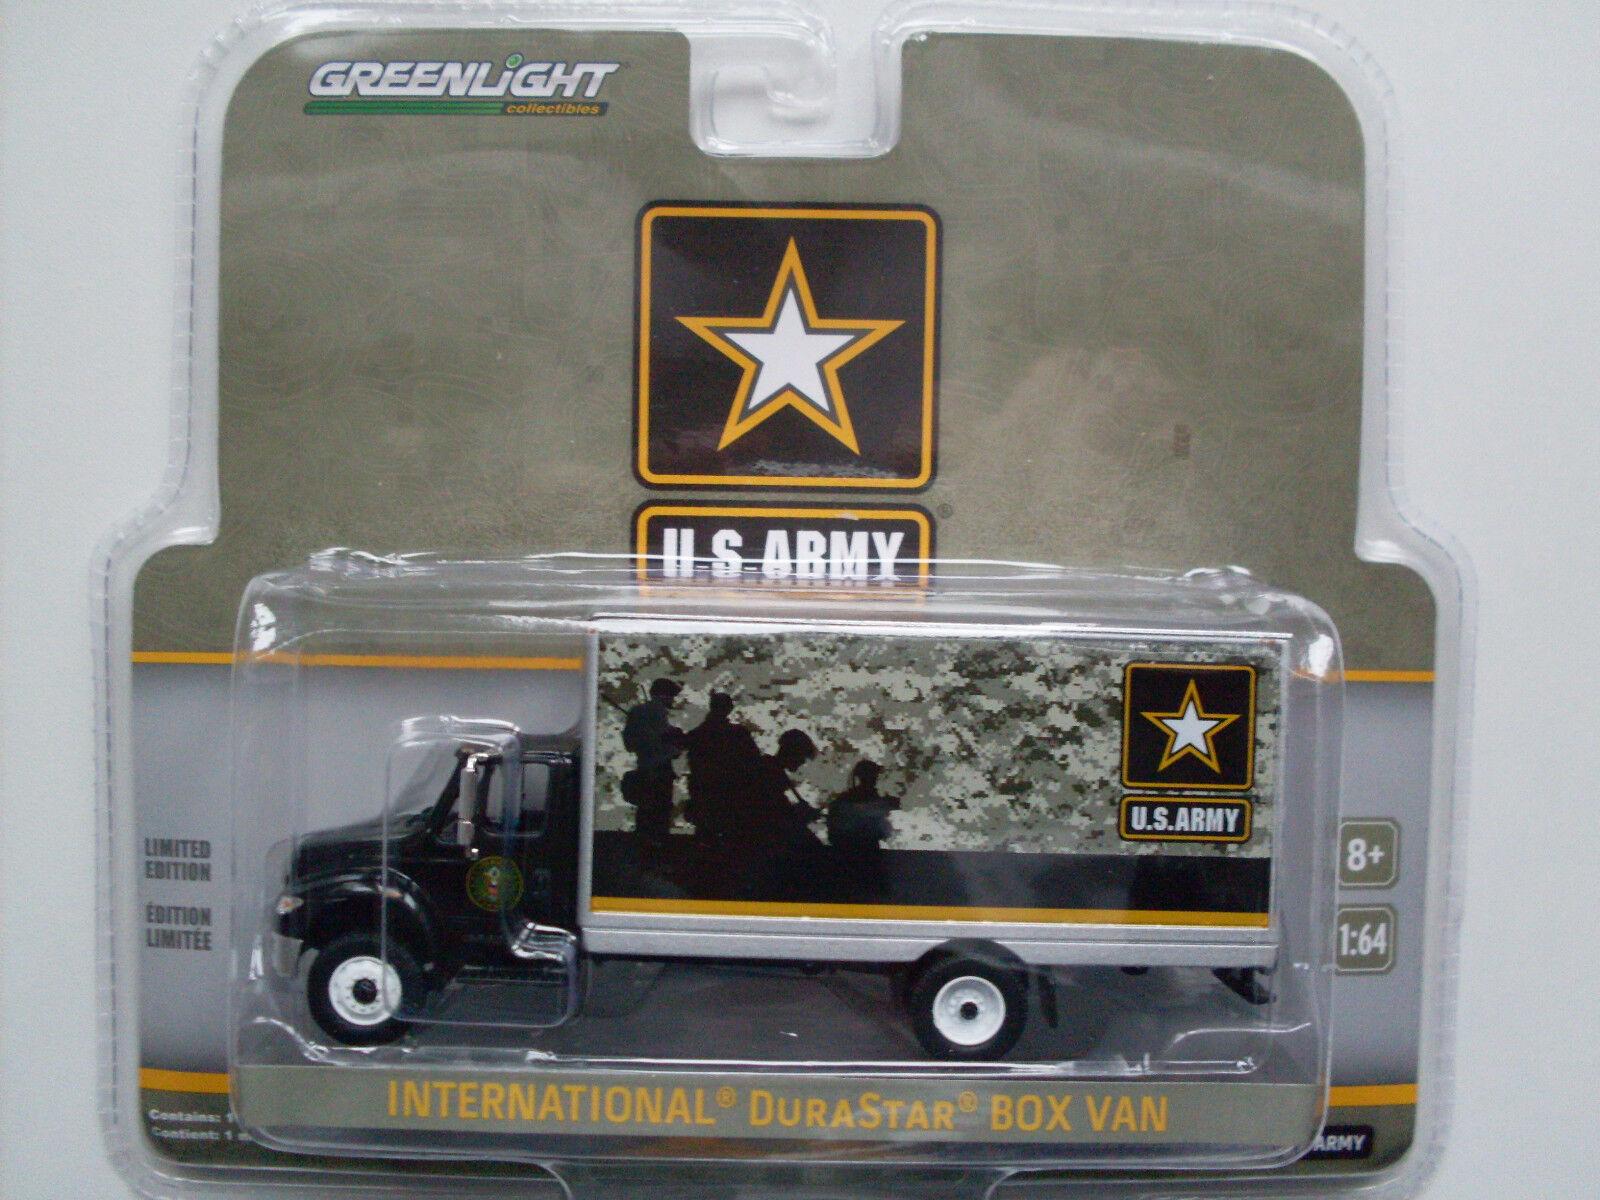 International Durastar Box Box Box Van   US Army  , Greenlight 1 64 Limited Edition 7bb30c